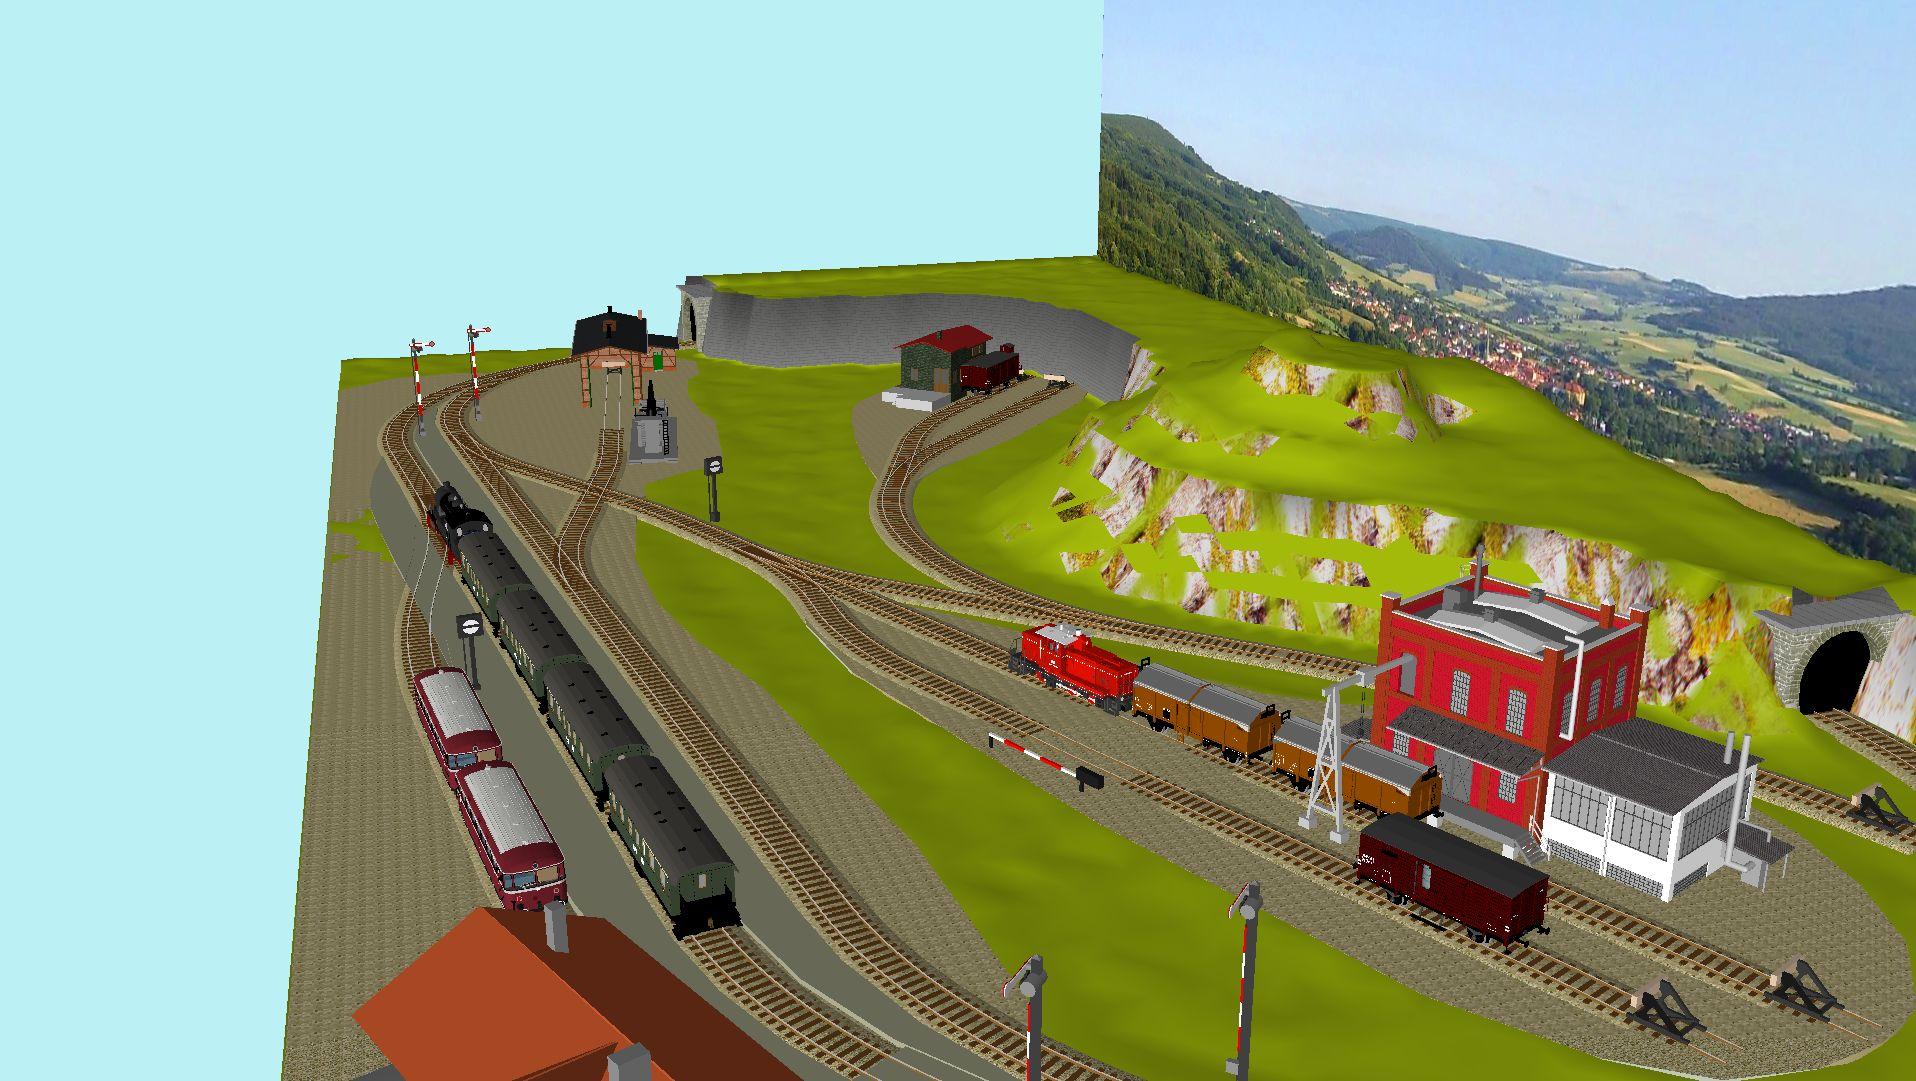 'ALBA Modellbahnpraxis' Band 1, Plan 5 Amp-1_5_k-gleis_239k2n